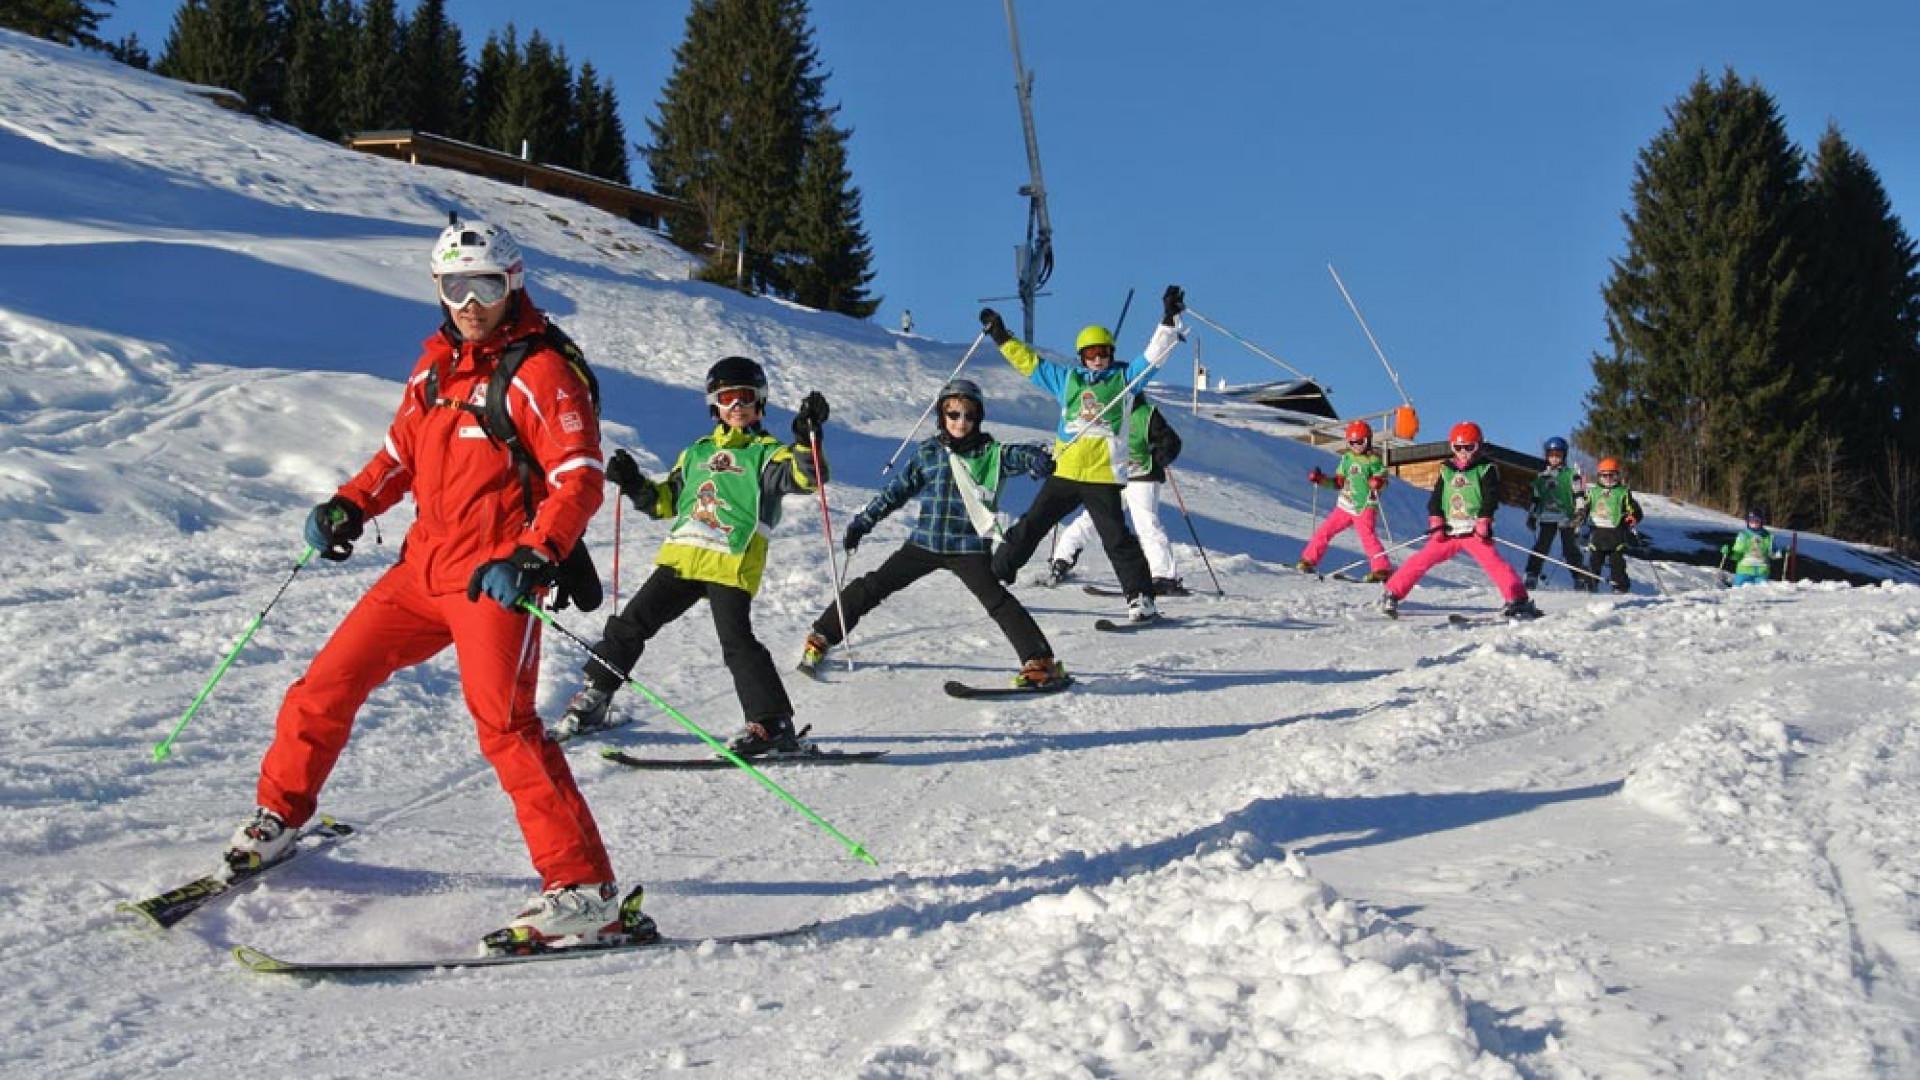 Ski School at Alphotel, Austria